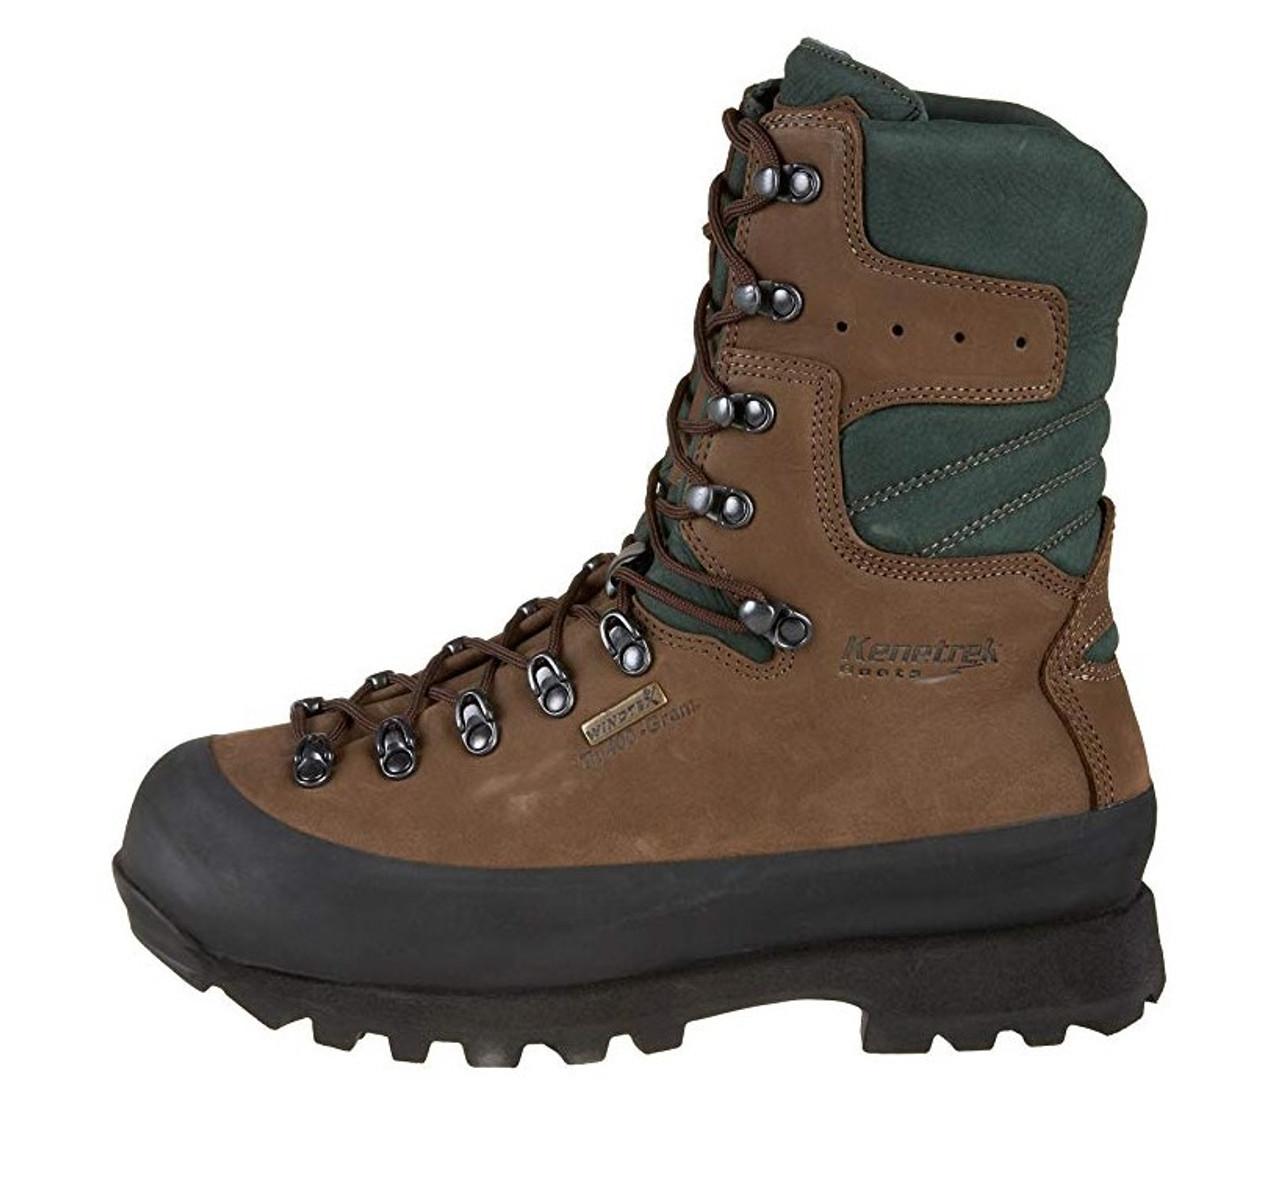 Details zu Kenetrek Mens Mountain Extreme Boots KE 420 NI Brown Leather Size 13